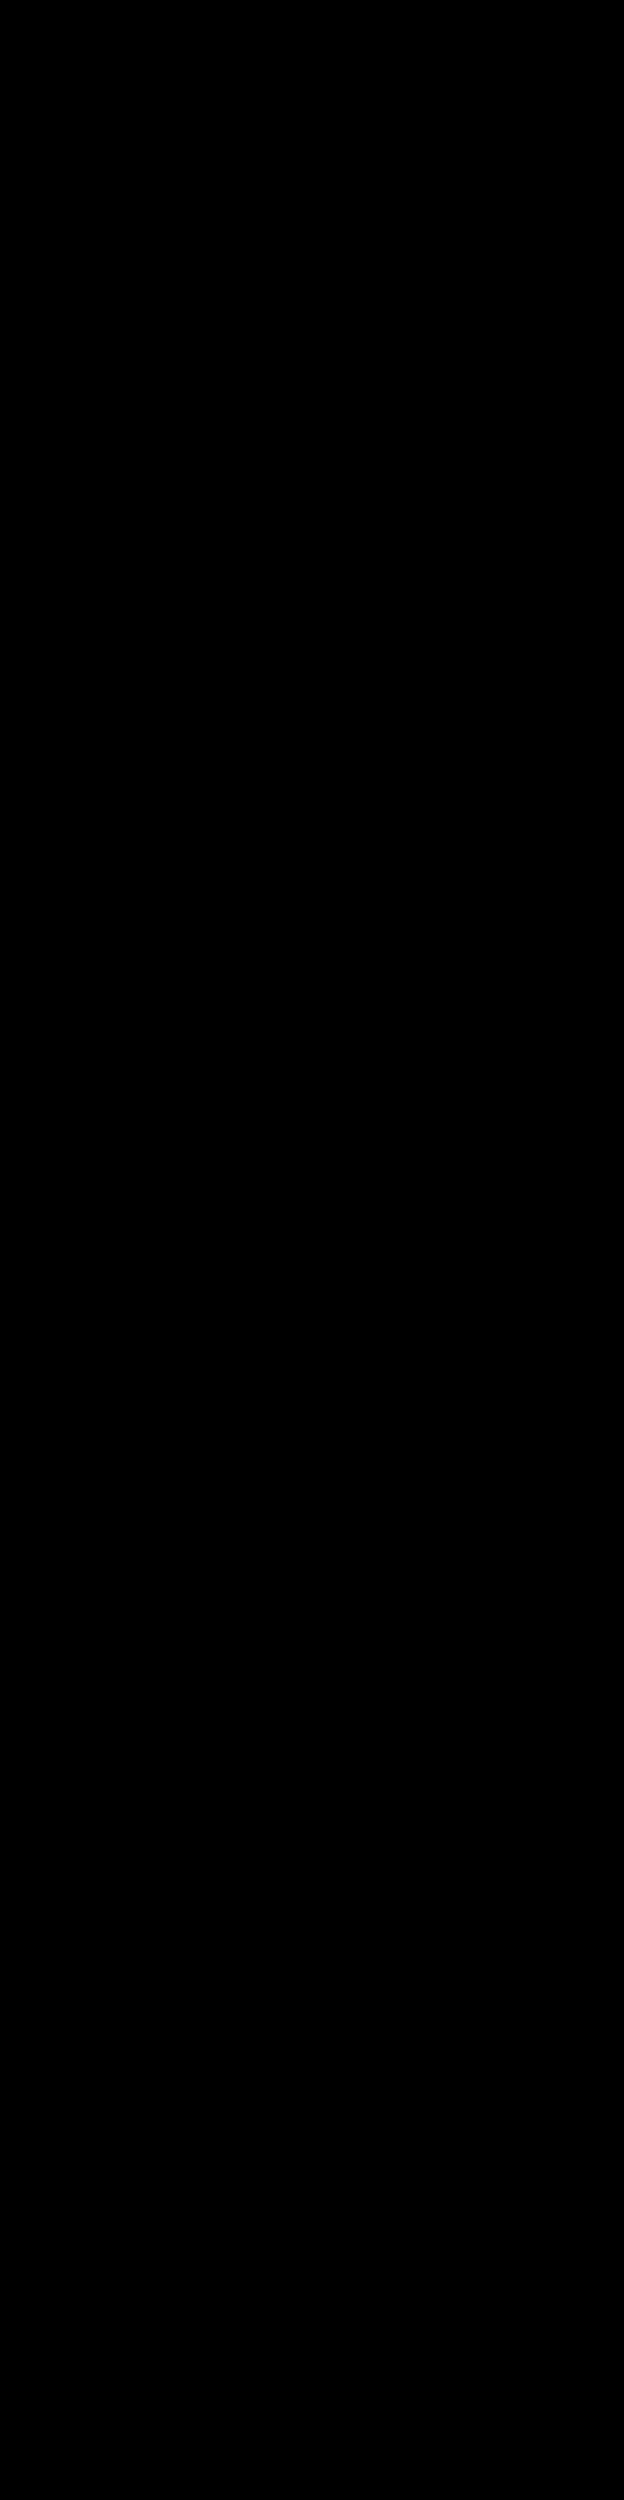 image?w=624&h=503&rev=5&ac=1